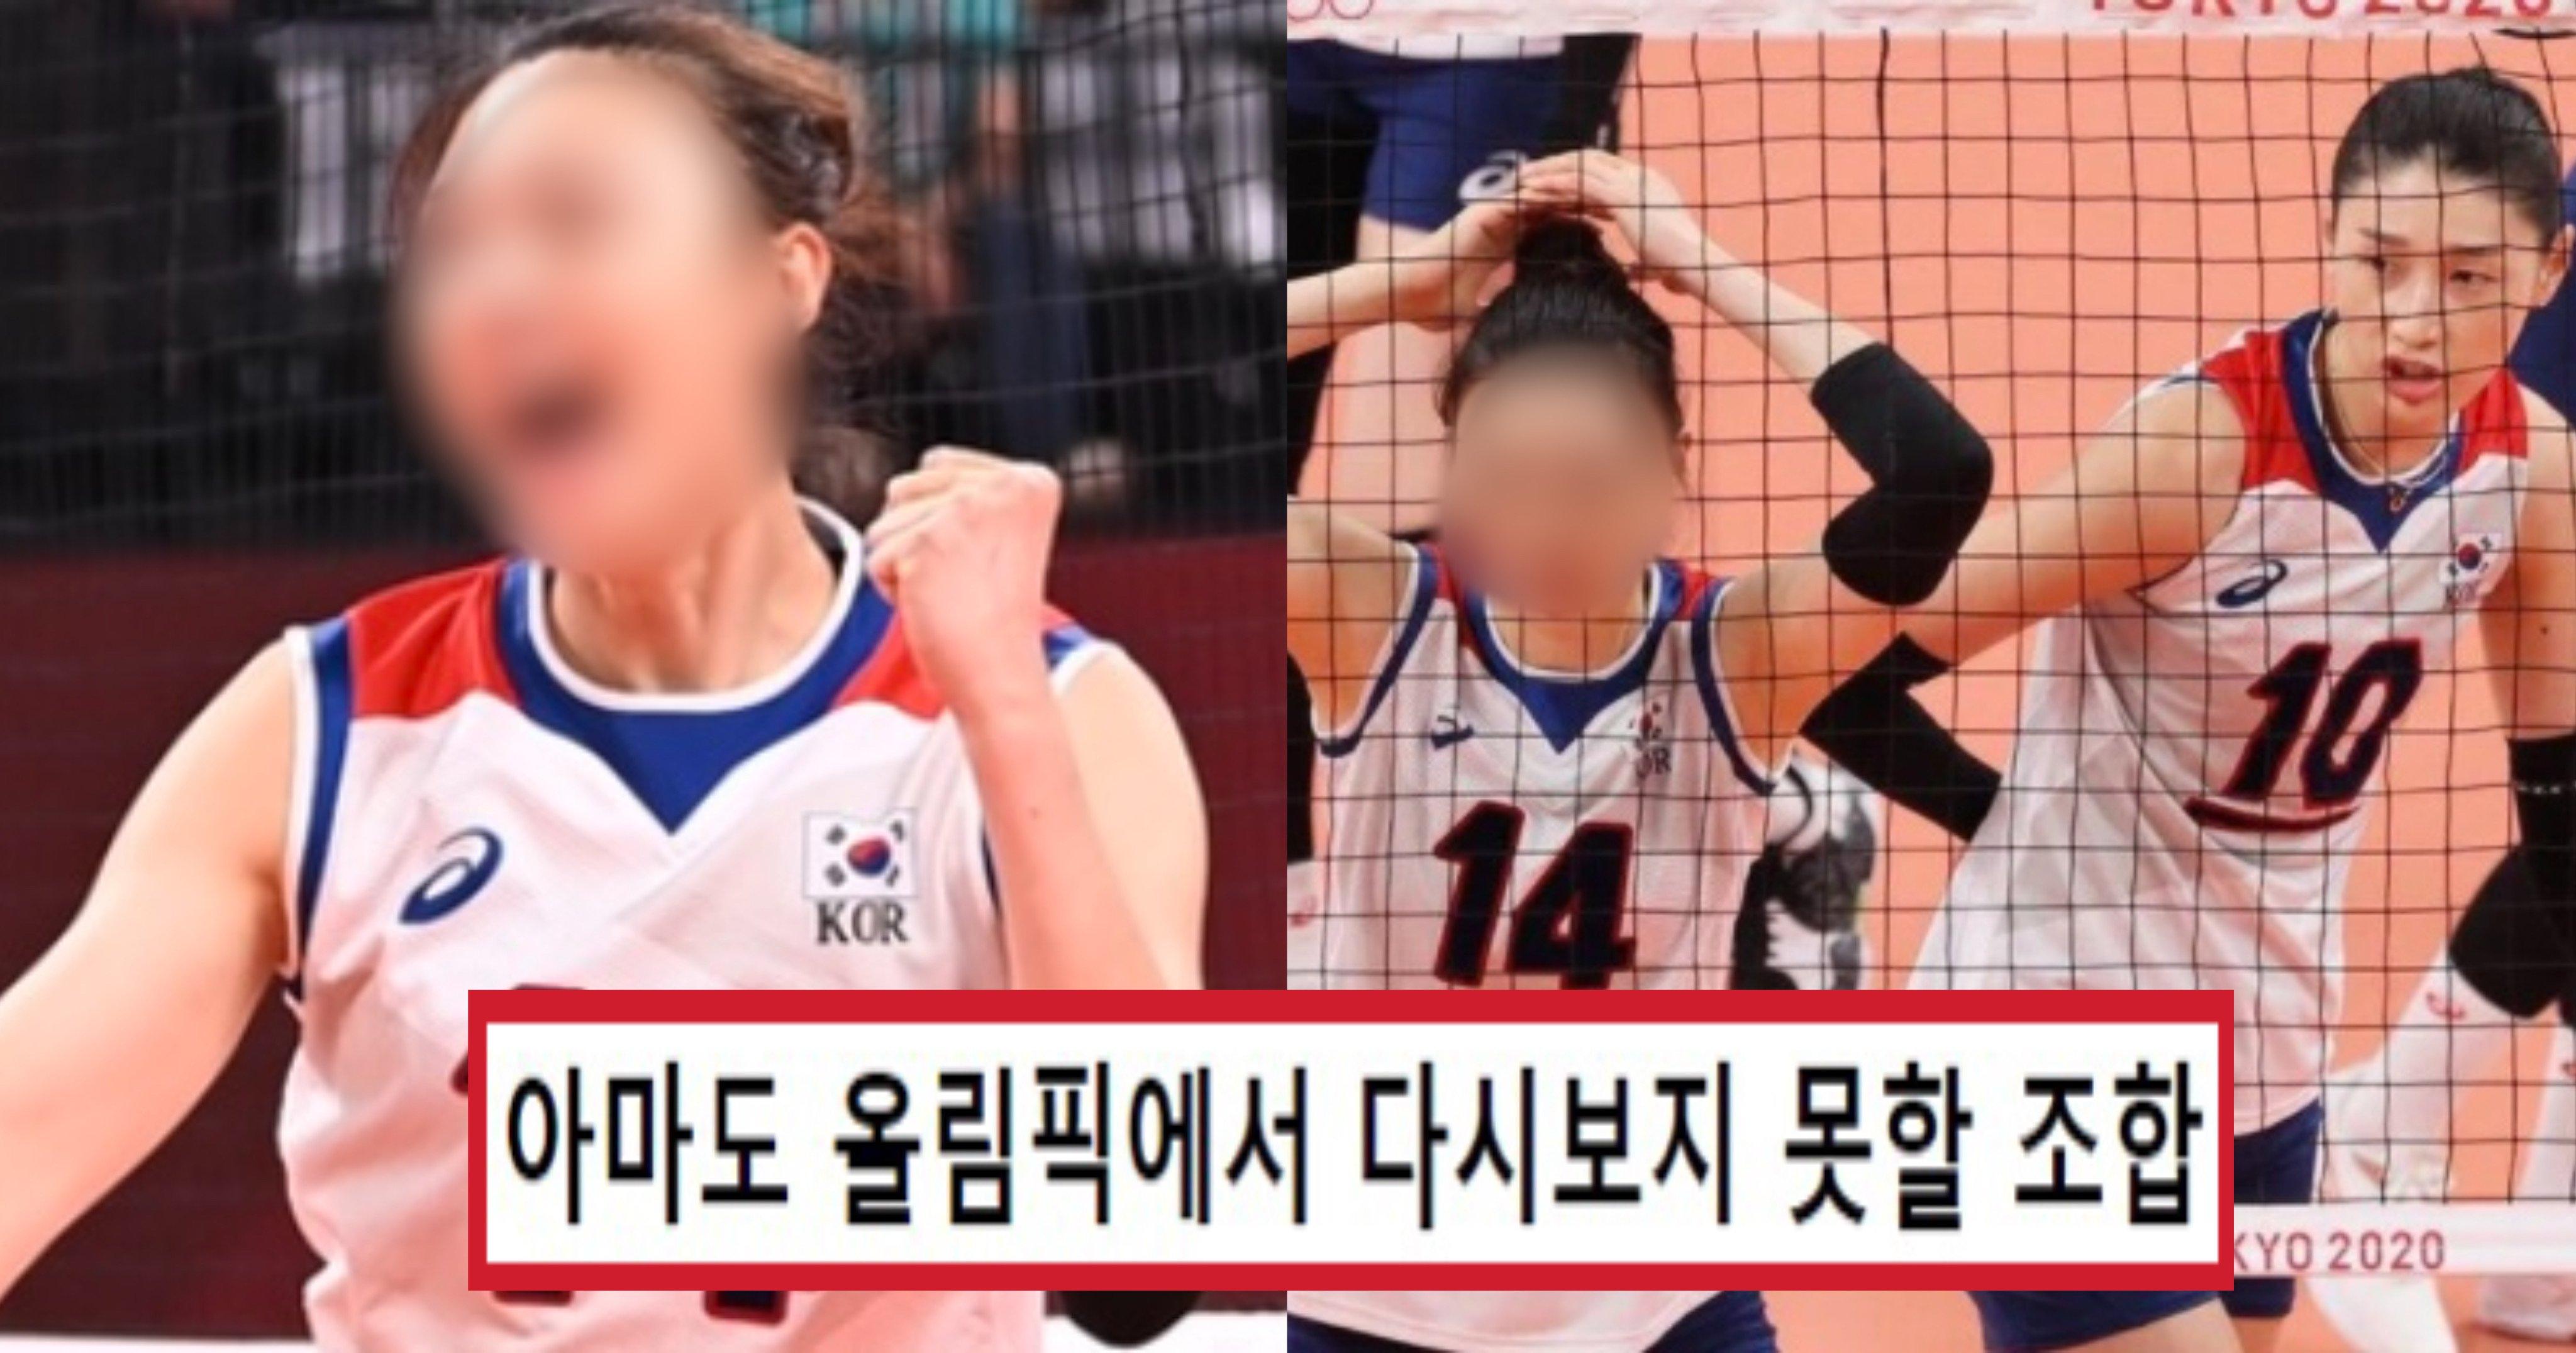 6c876b64 f3f9 4d45 9b83 55982558f431.jpeg?resize=1200,630 - 김연경과 함께 이번 올림픽을 끝으로 국가대표 은퇴인 또 다른 여자 배구 선수